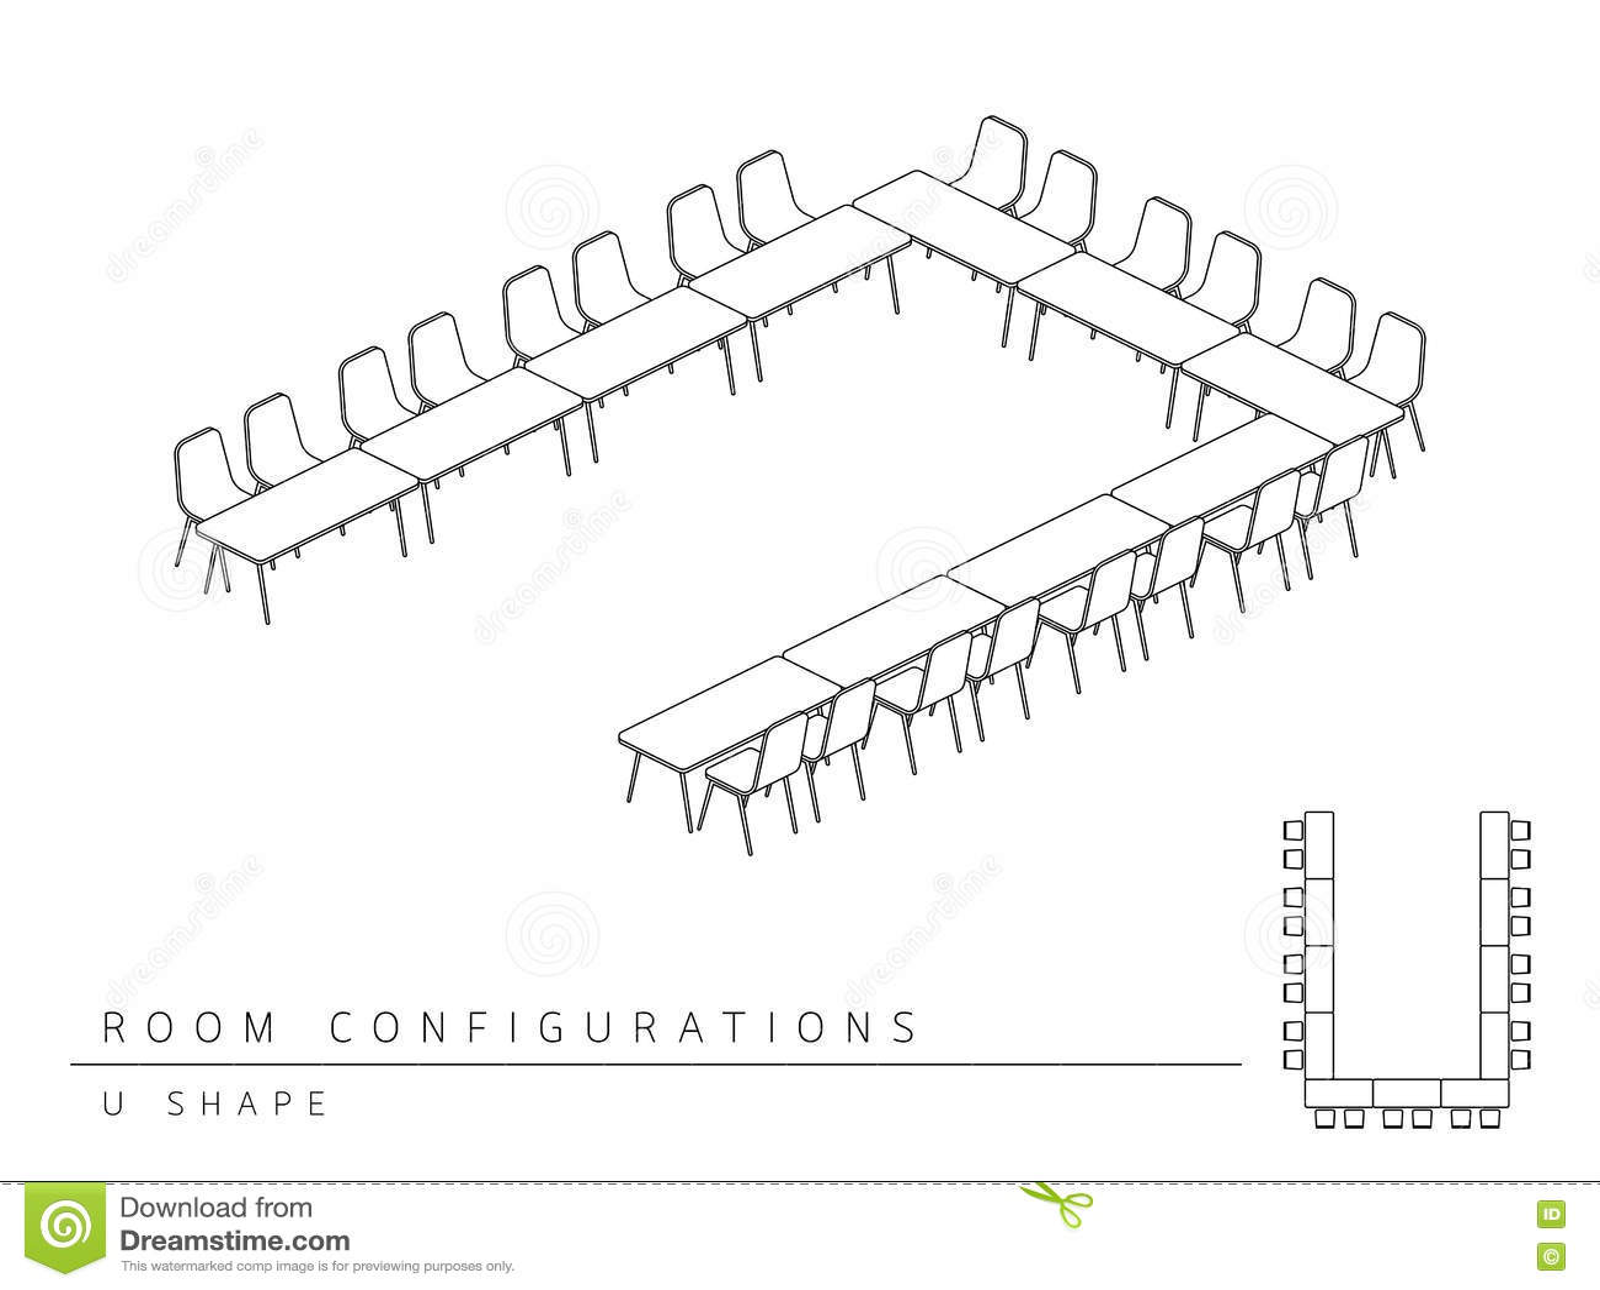 hight resolution of meeting room setup layout configuration u shape style